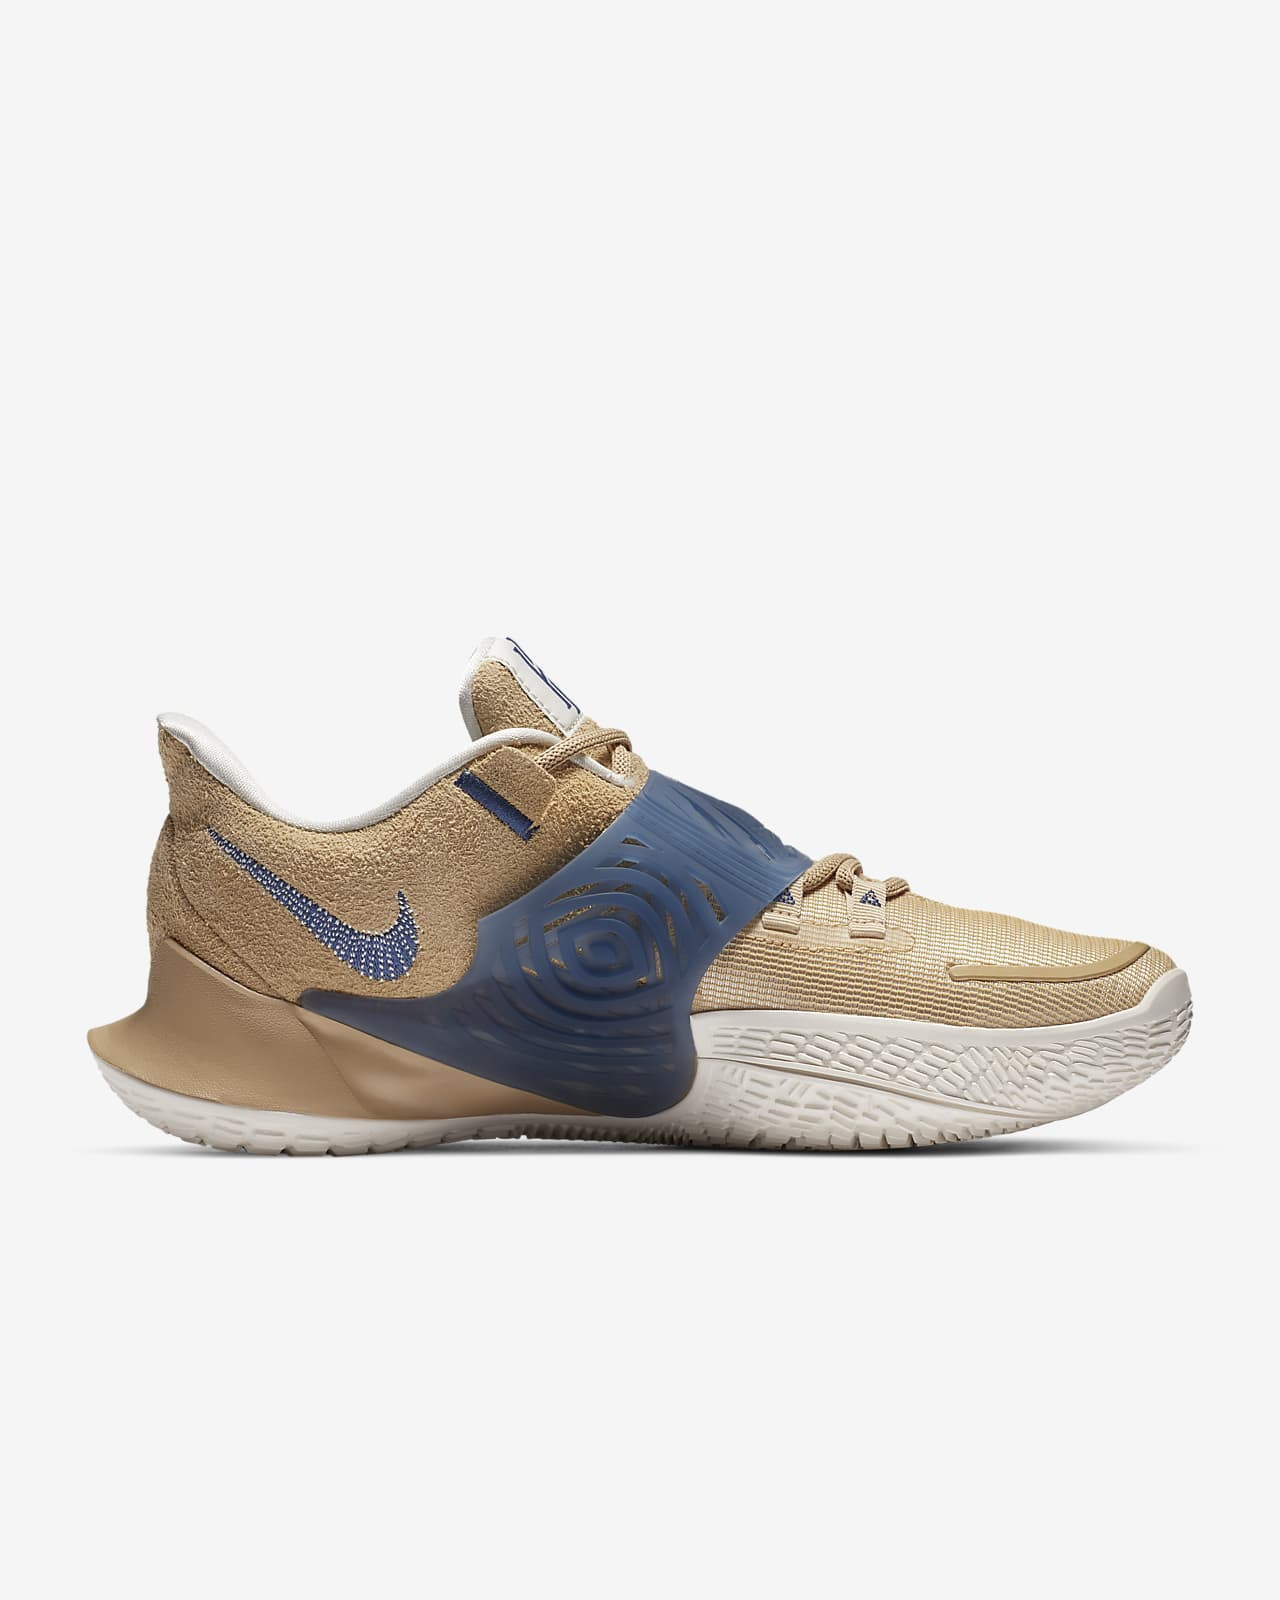 Kyrie Low 3 EP Basketball Shoe. Nike ID